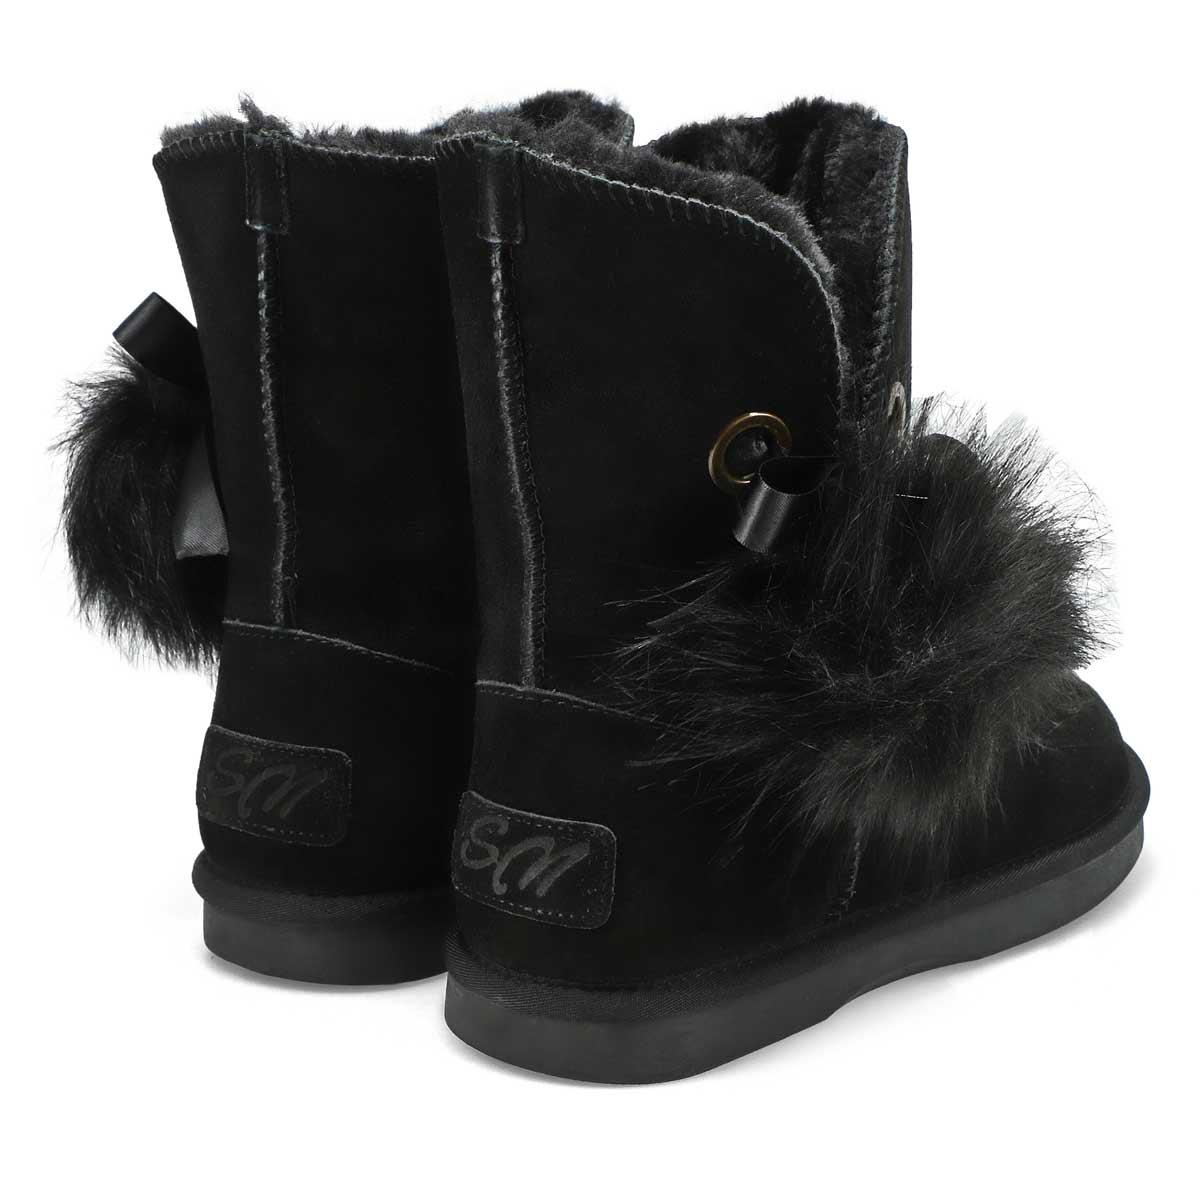 Lds Smocs Pom black suede boot